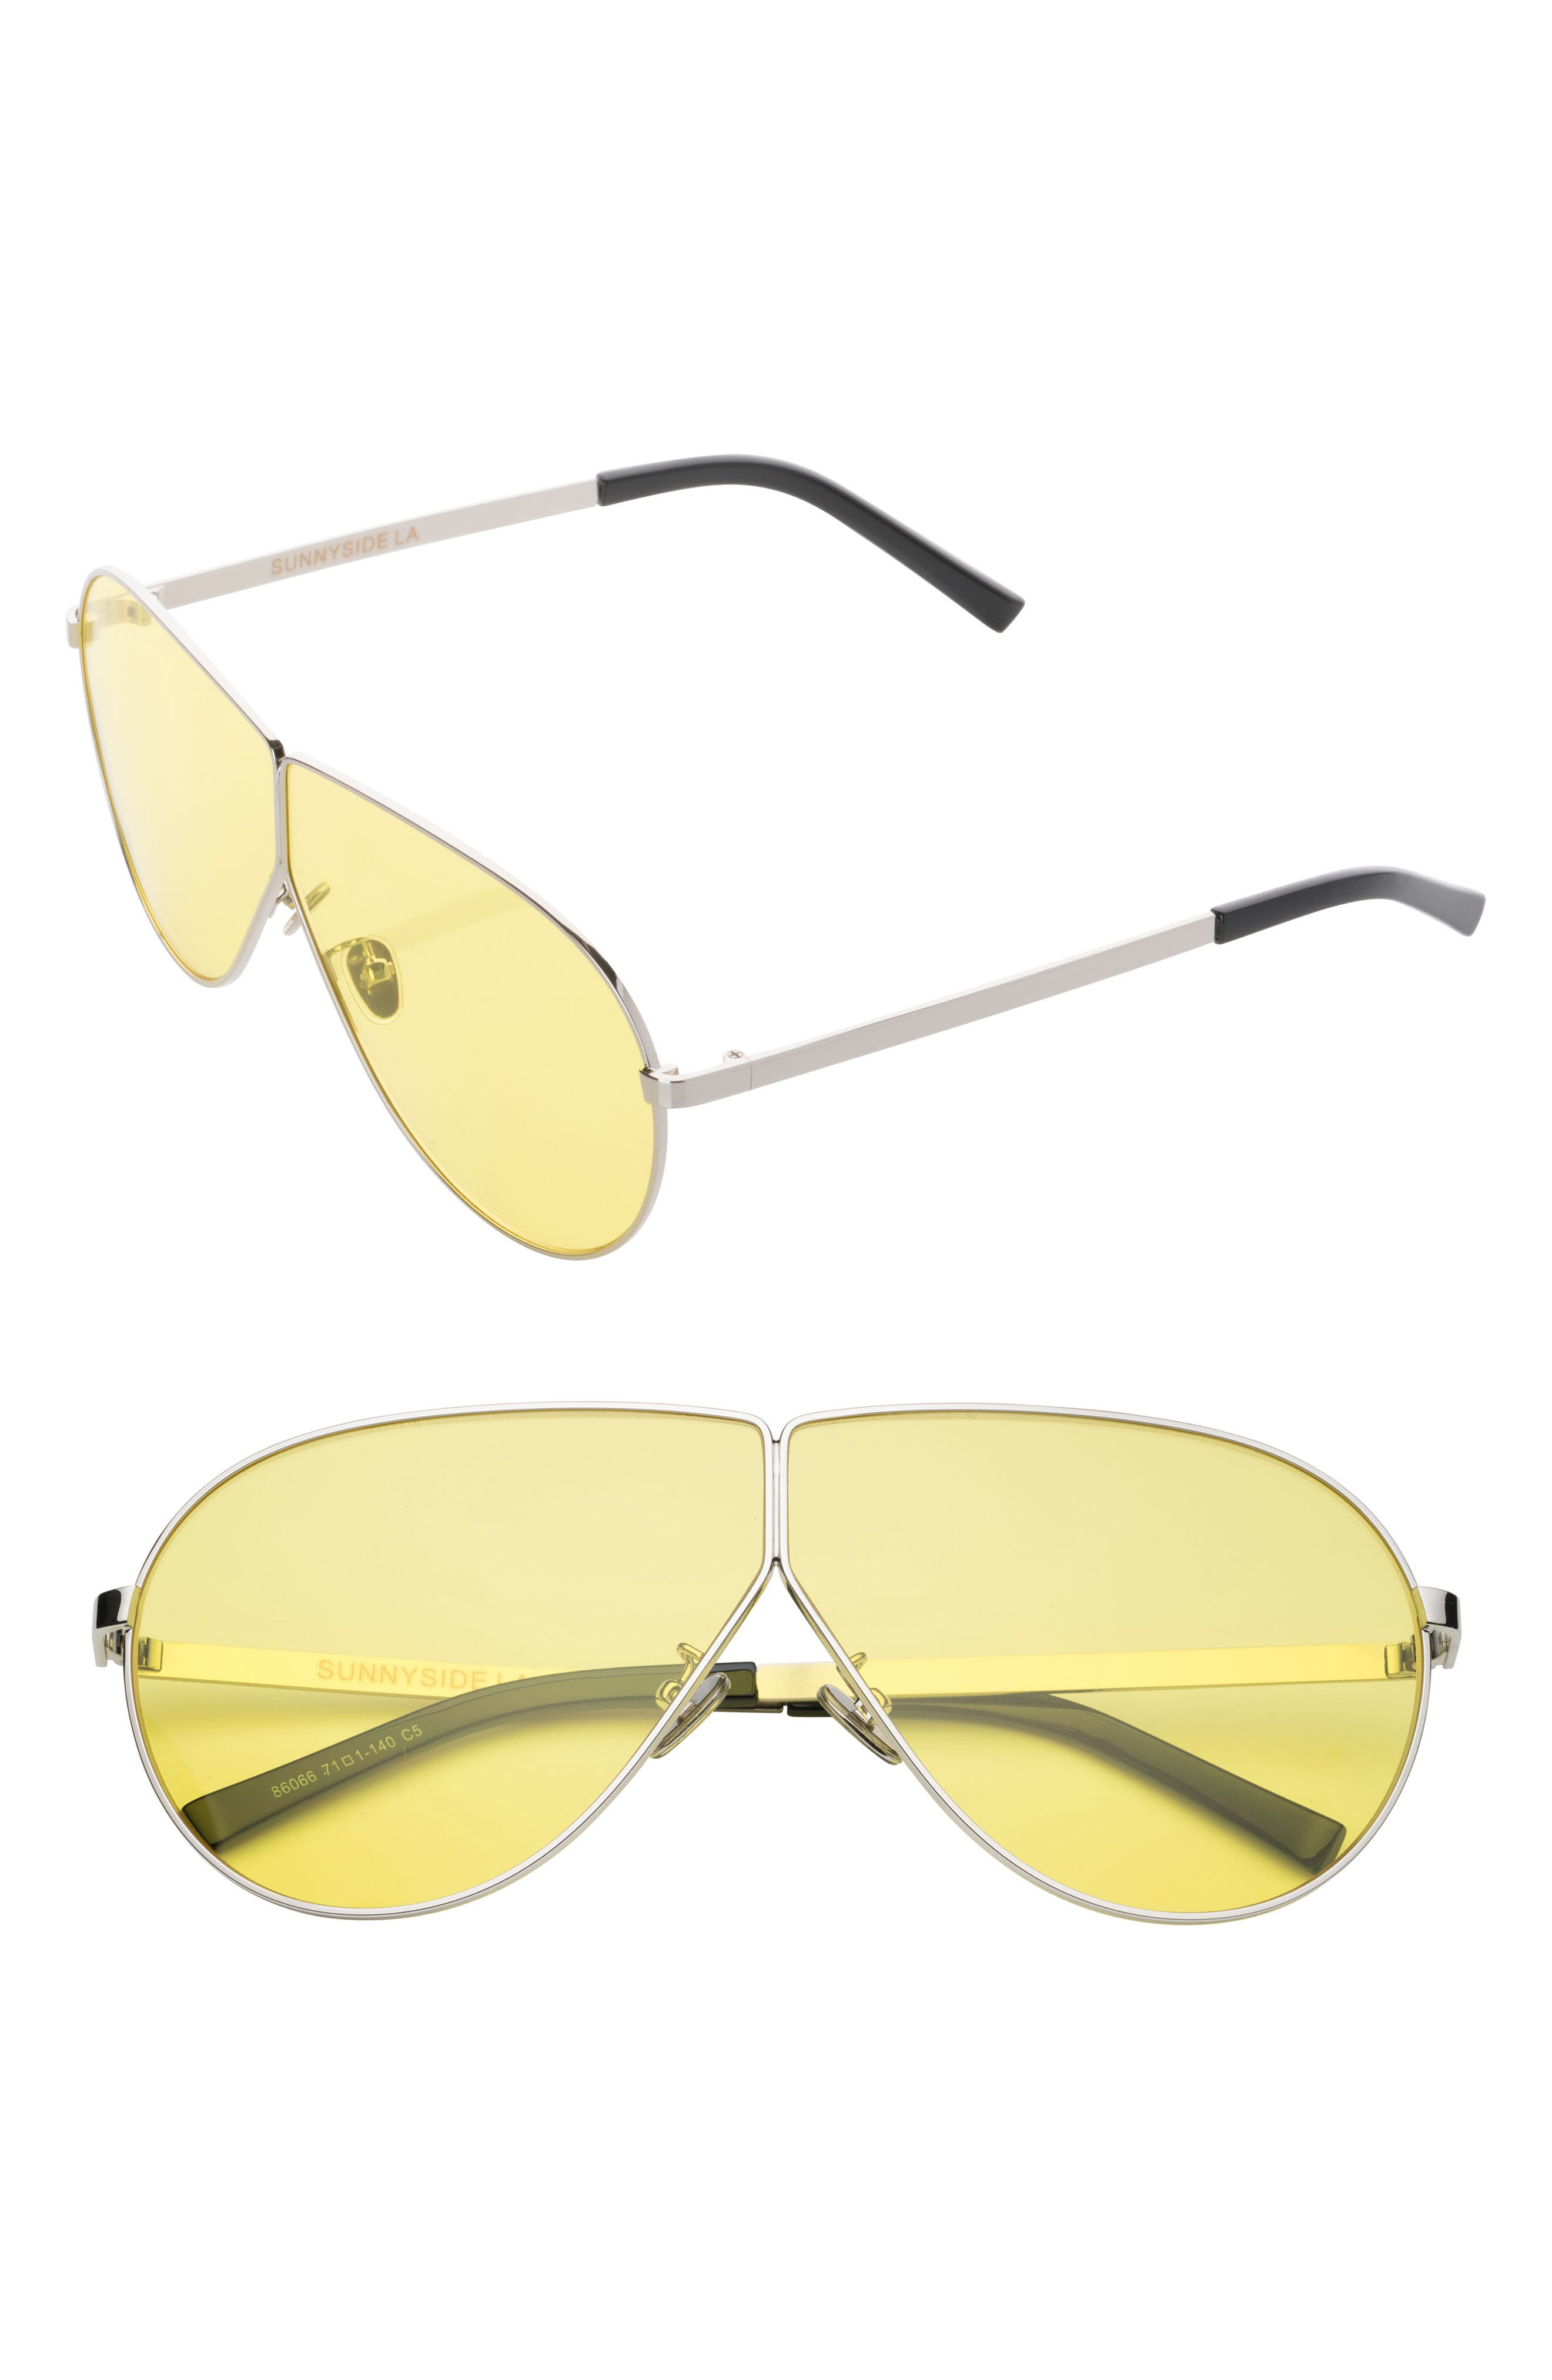 SunnySide LA 57mm Shield Sunglasses